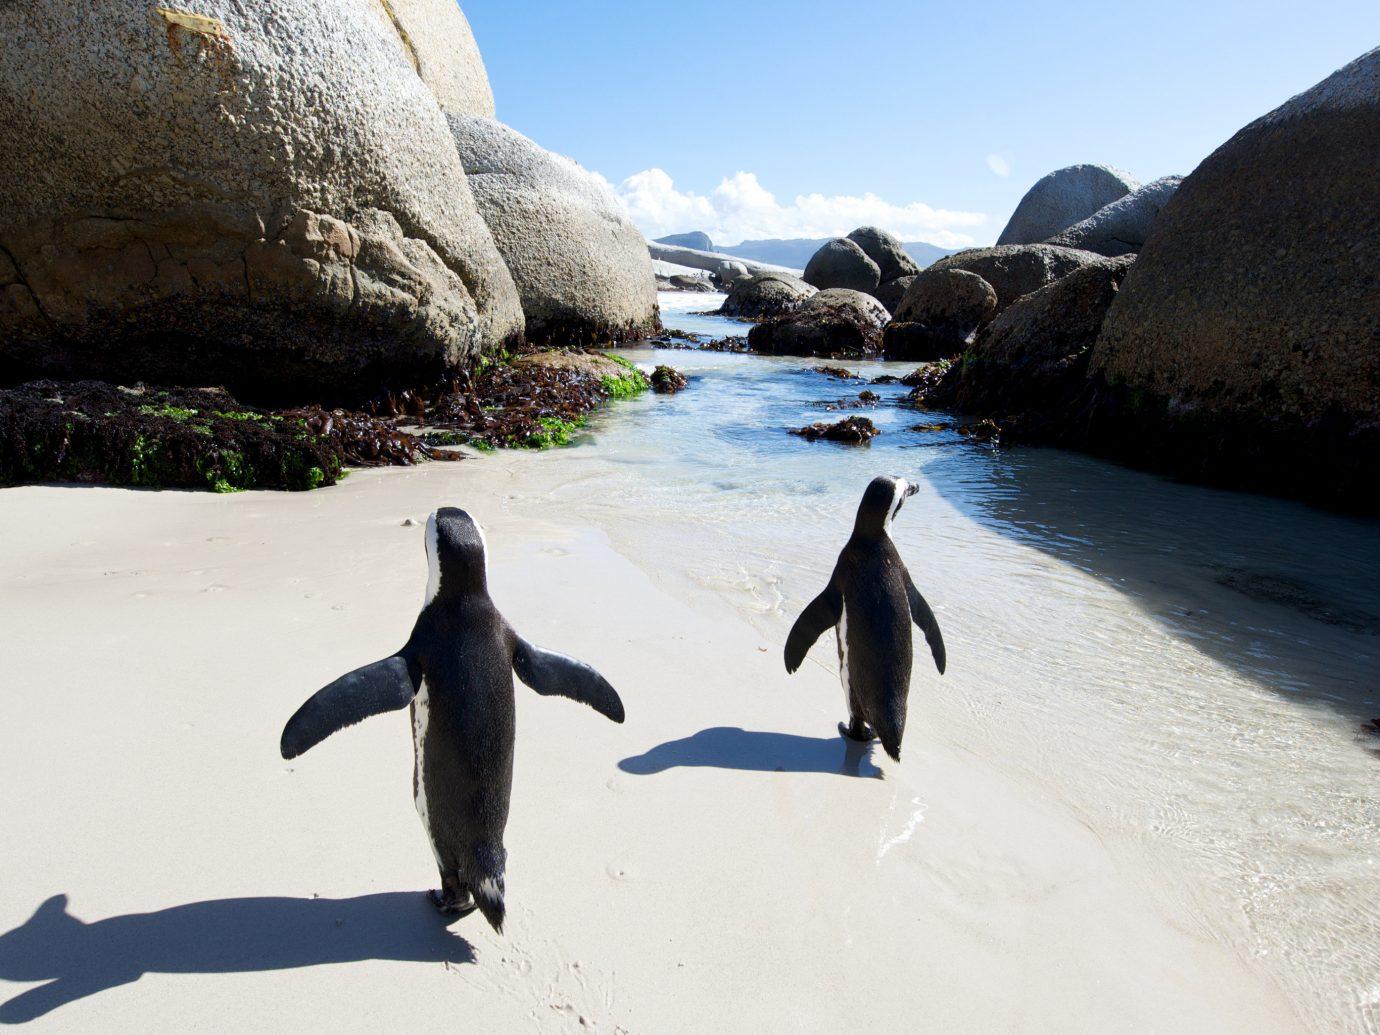 Trip Ideas outdoor sky water mountain rock Nature flightless bird penguin Sea Bird